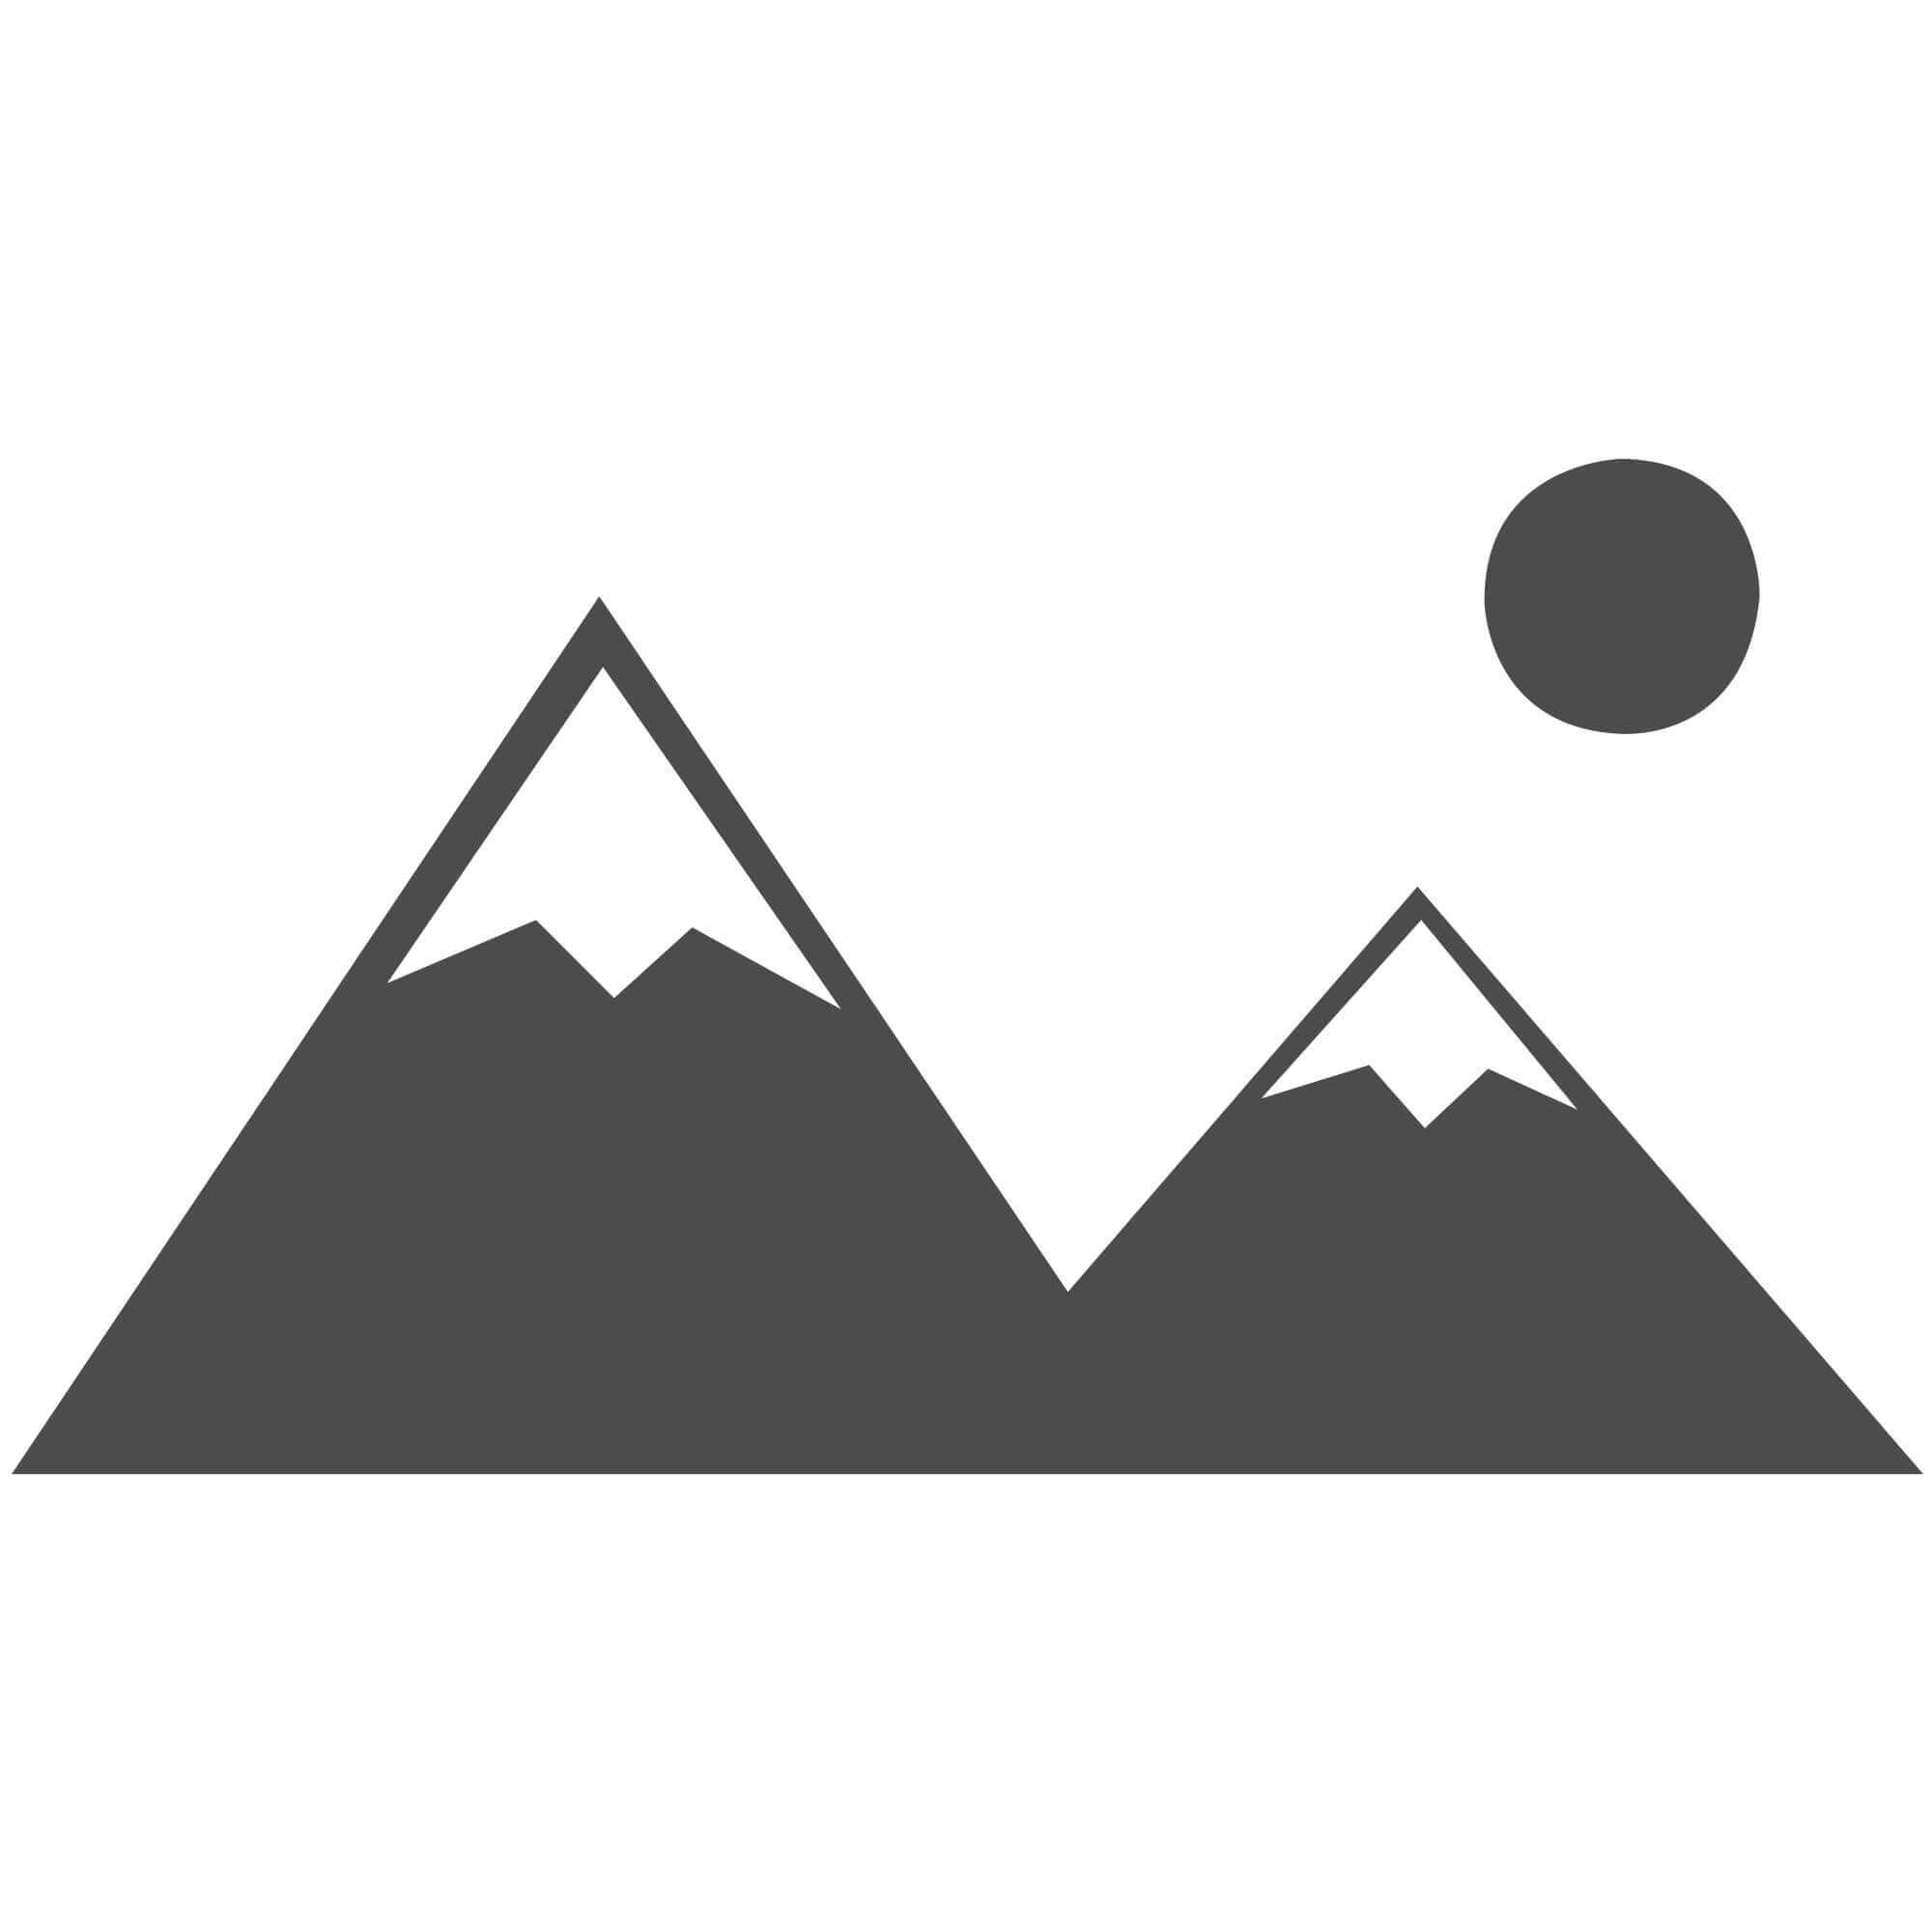 Griot Stripe Rug - Kalimba - KI804 Clove